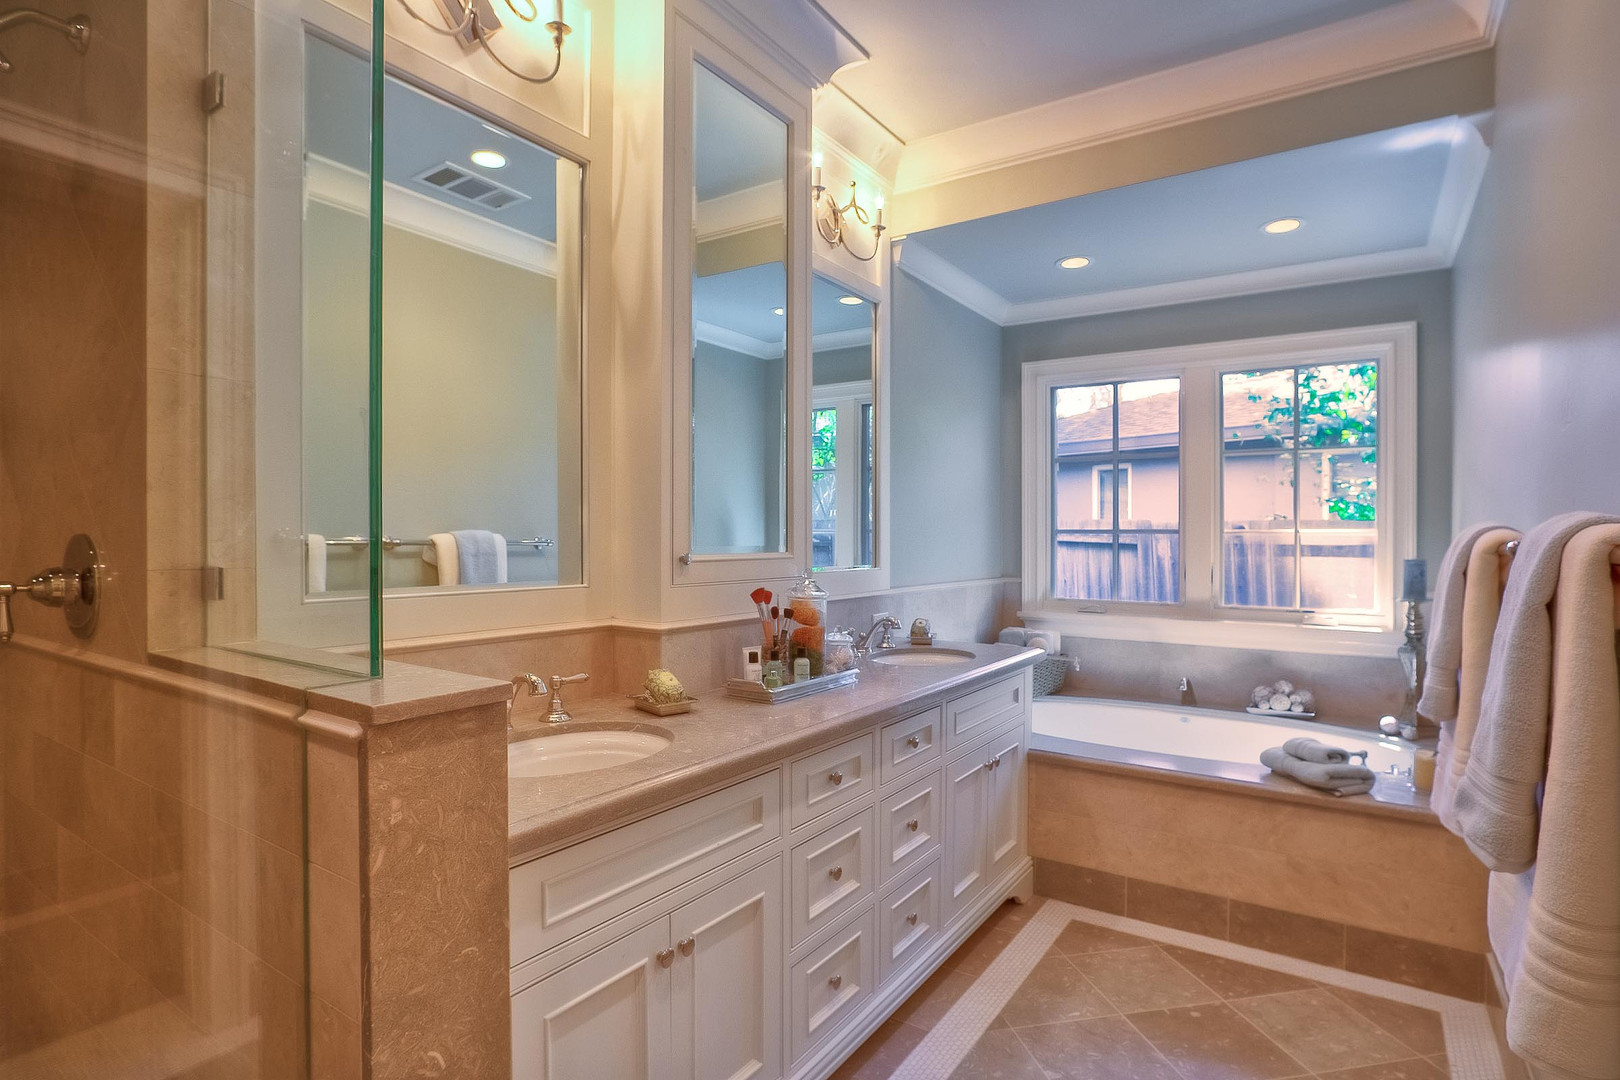 Transitional - East Creek - Master Bath